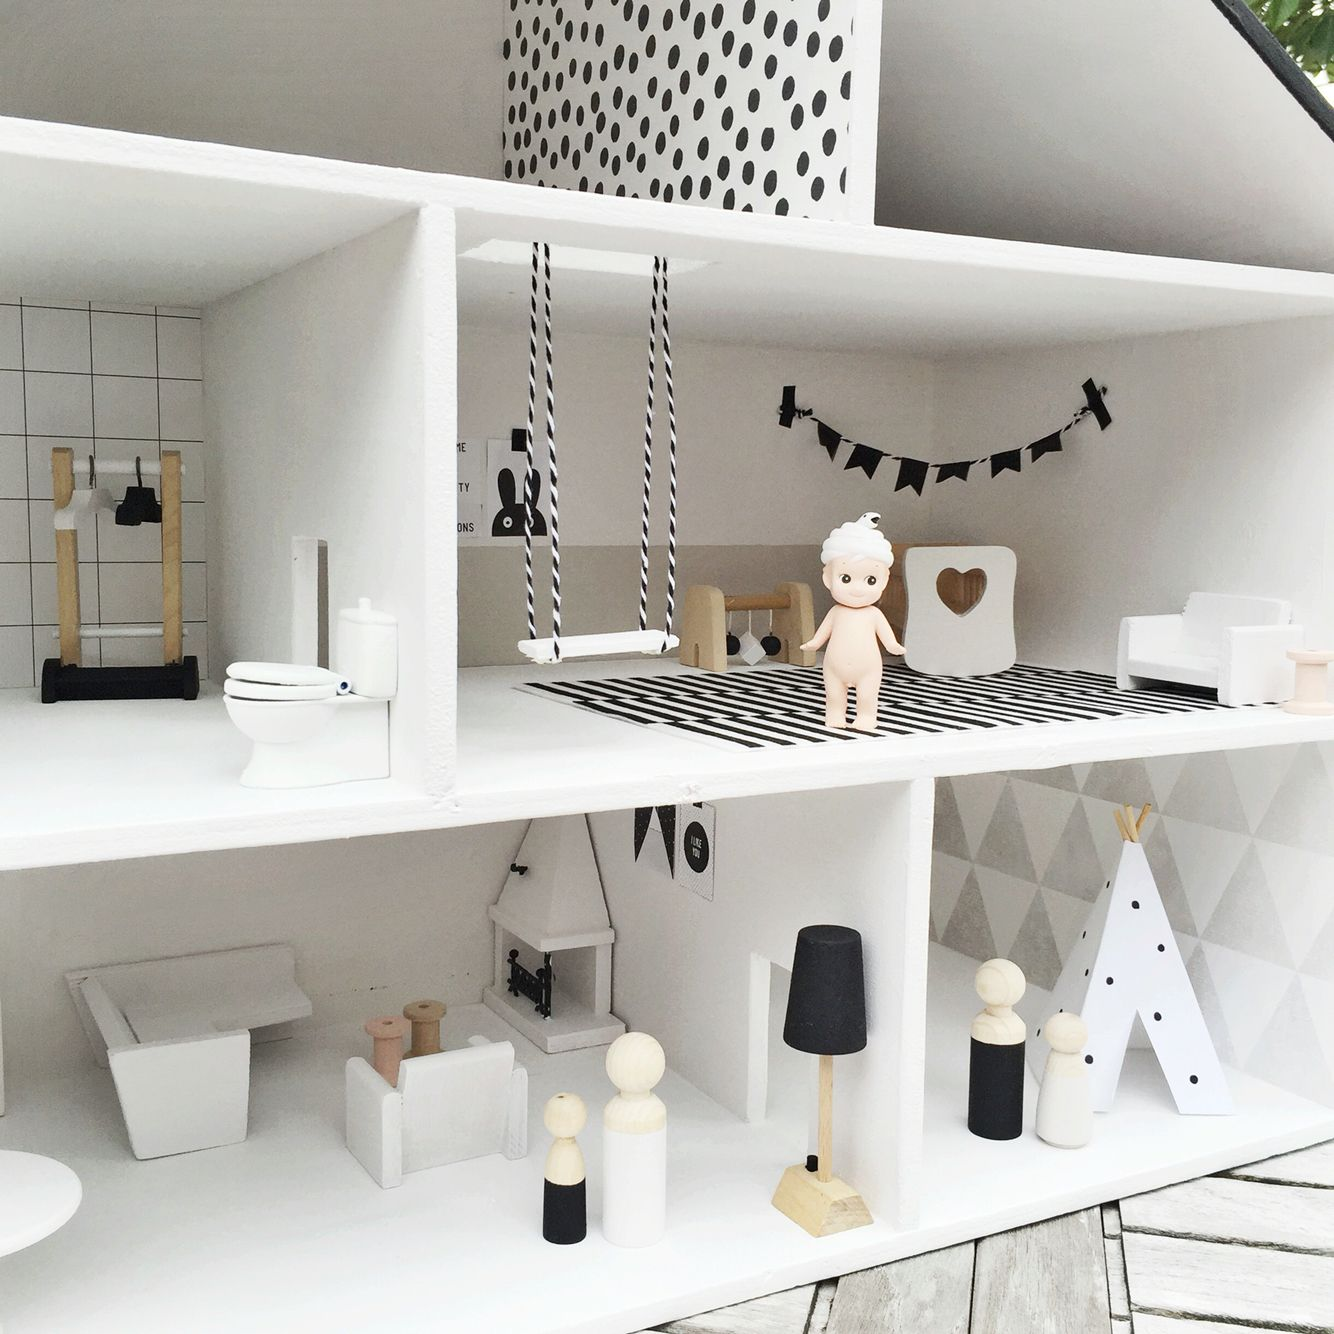 Dollhouse by @rosanvleeuwenn